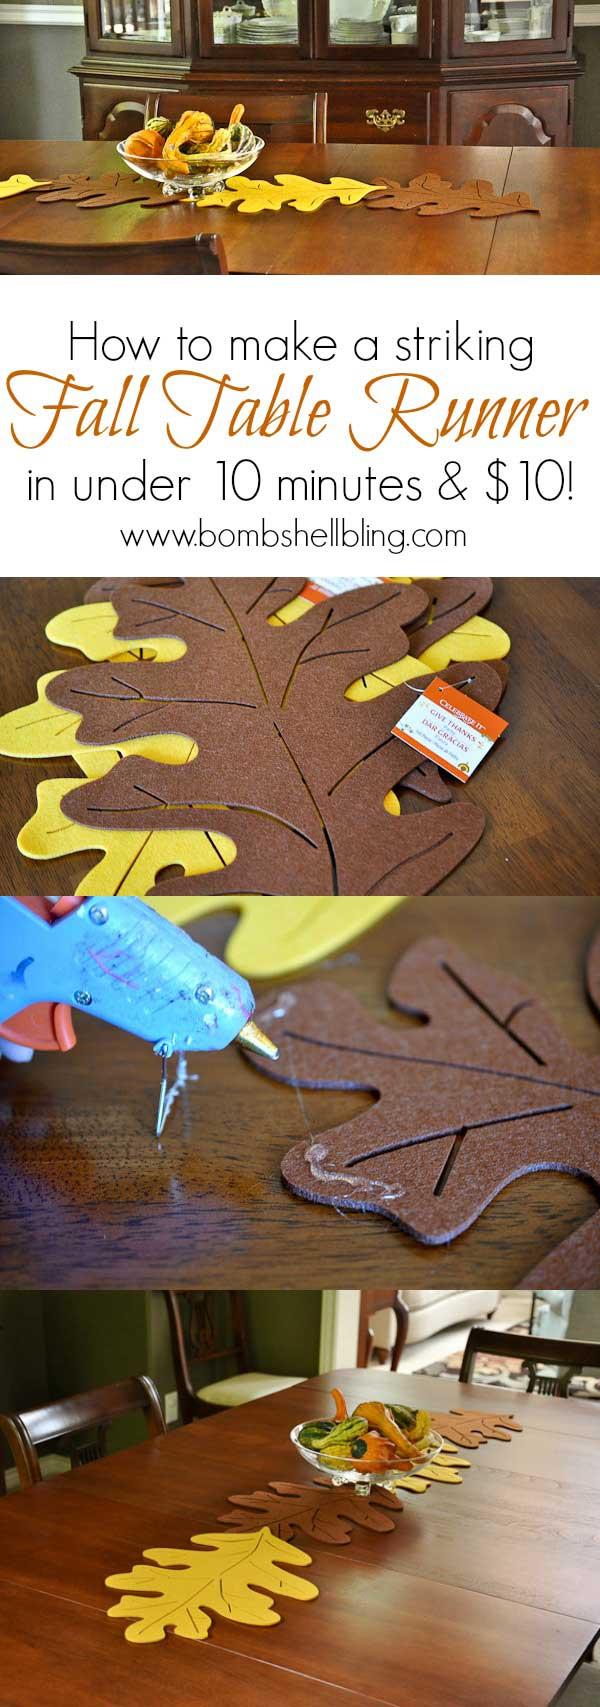 Fall-Home-Decor-ideas-23